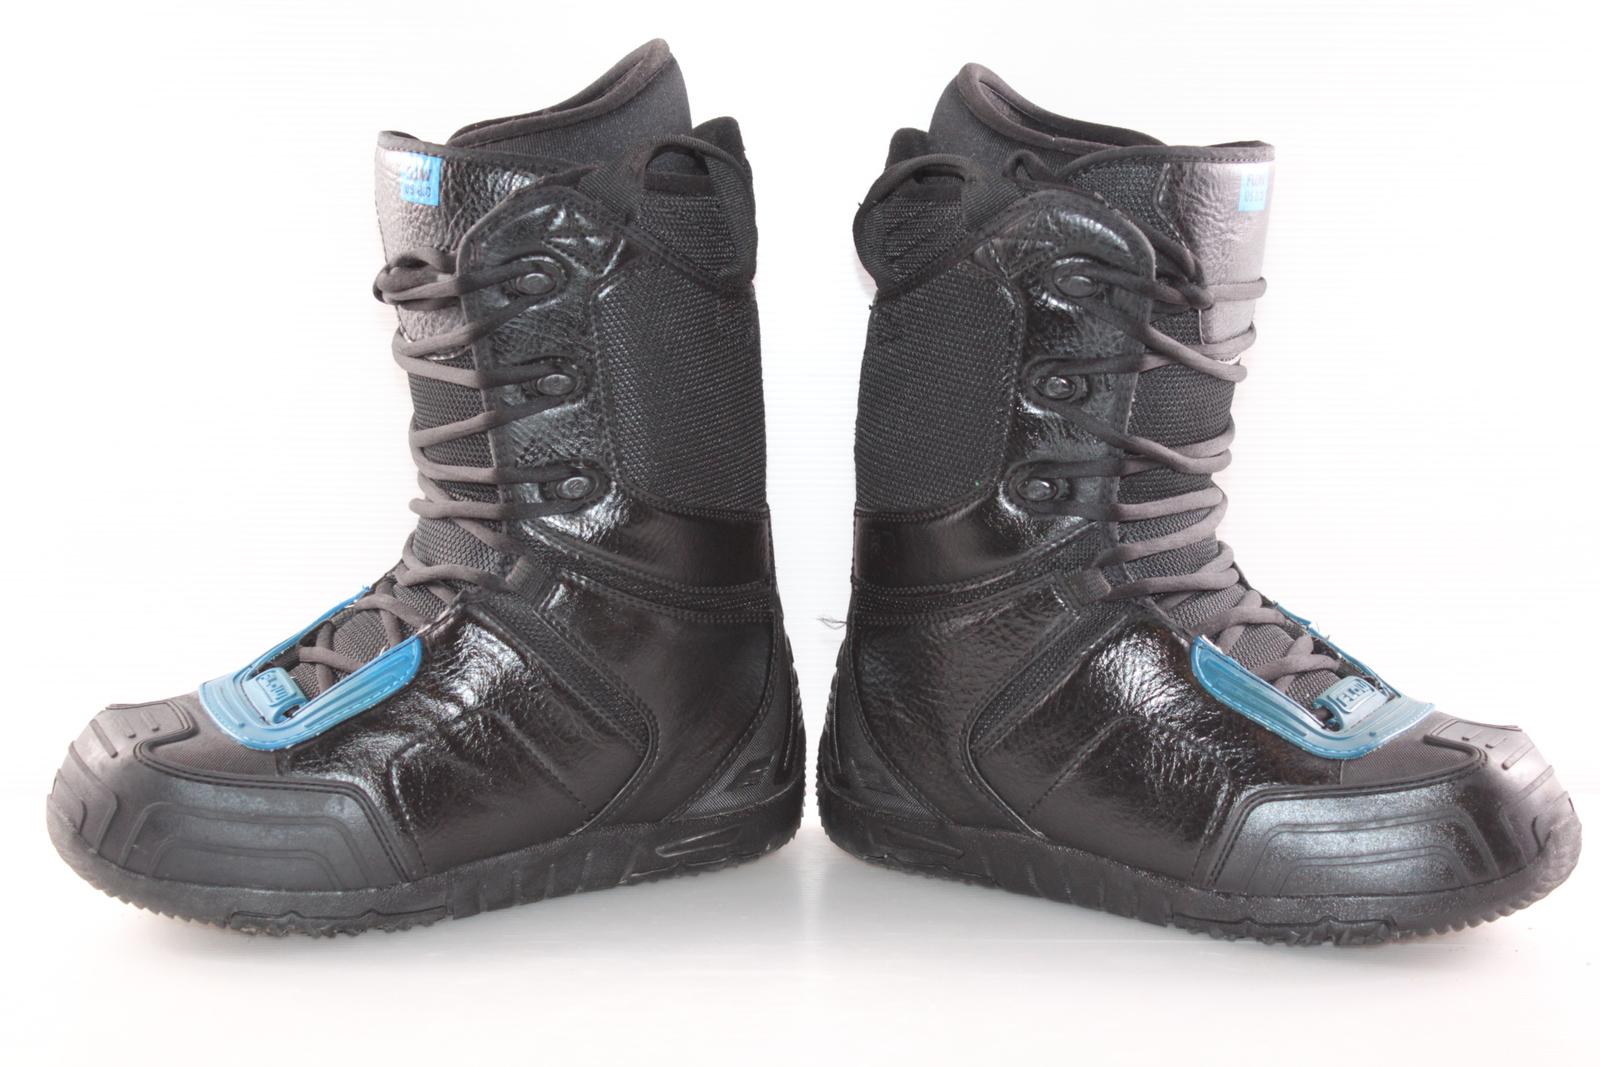 Snowboardové boty Flow Flow vel.40.5